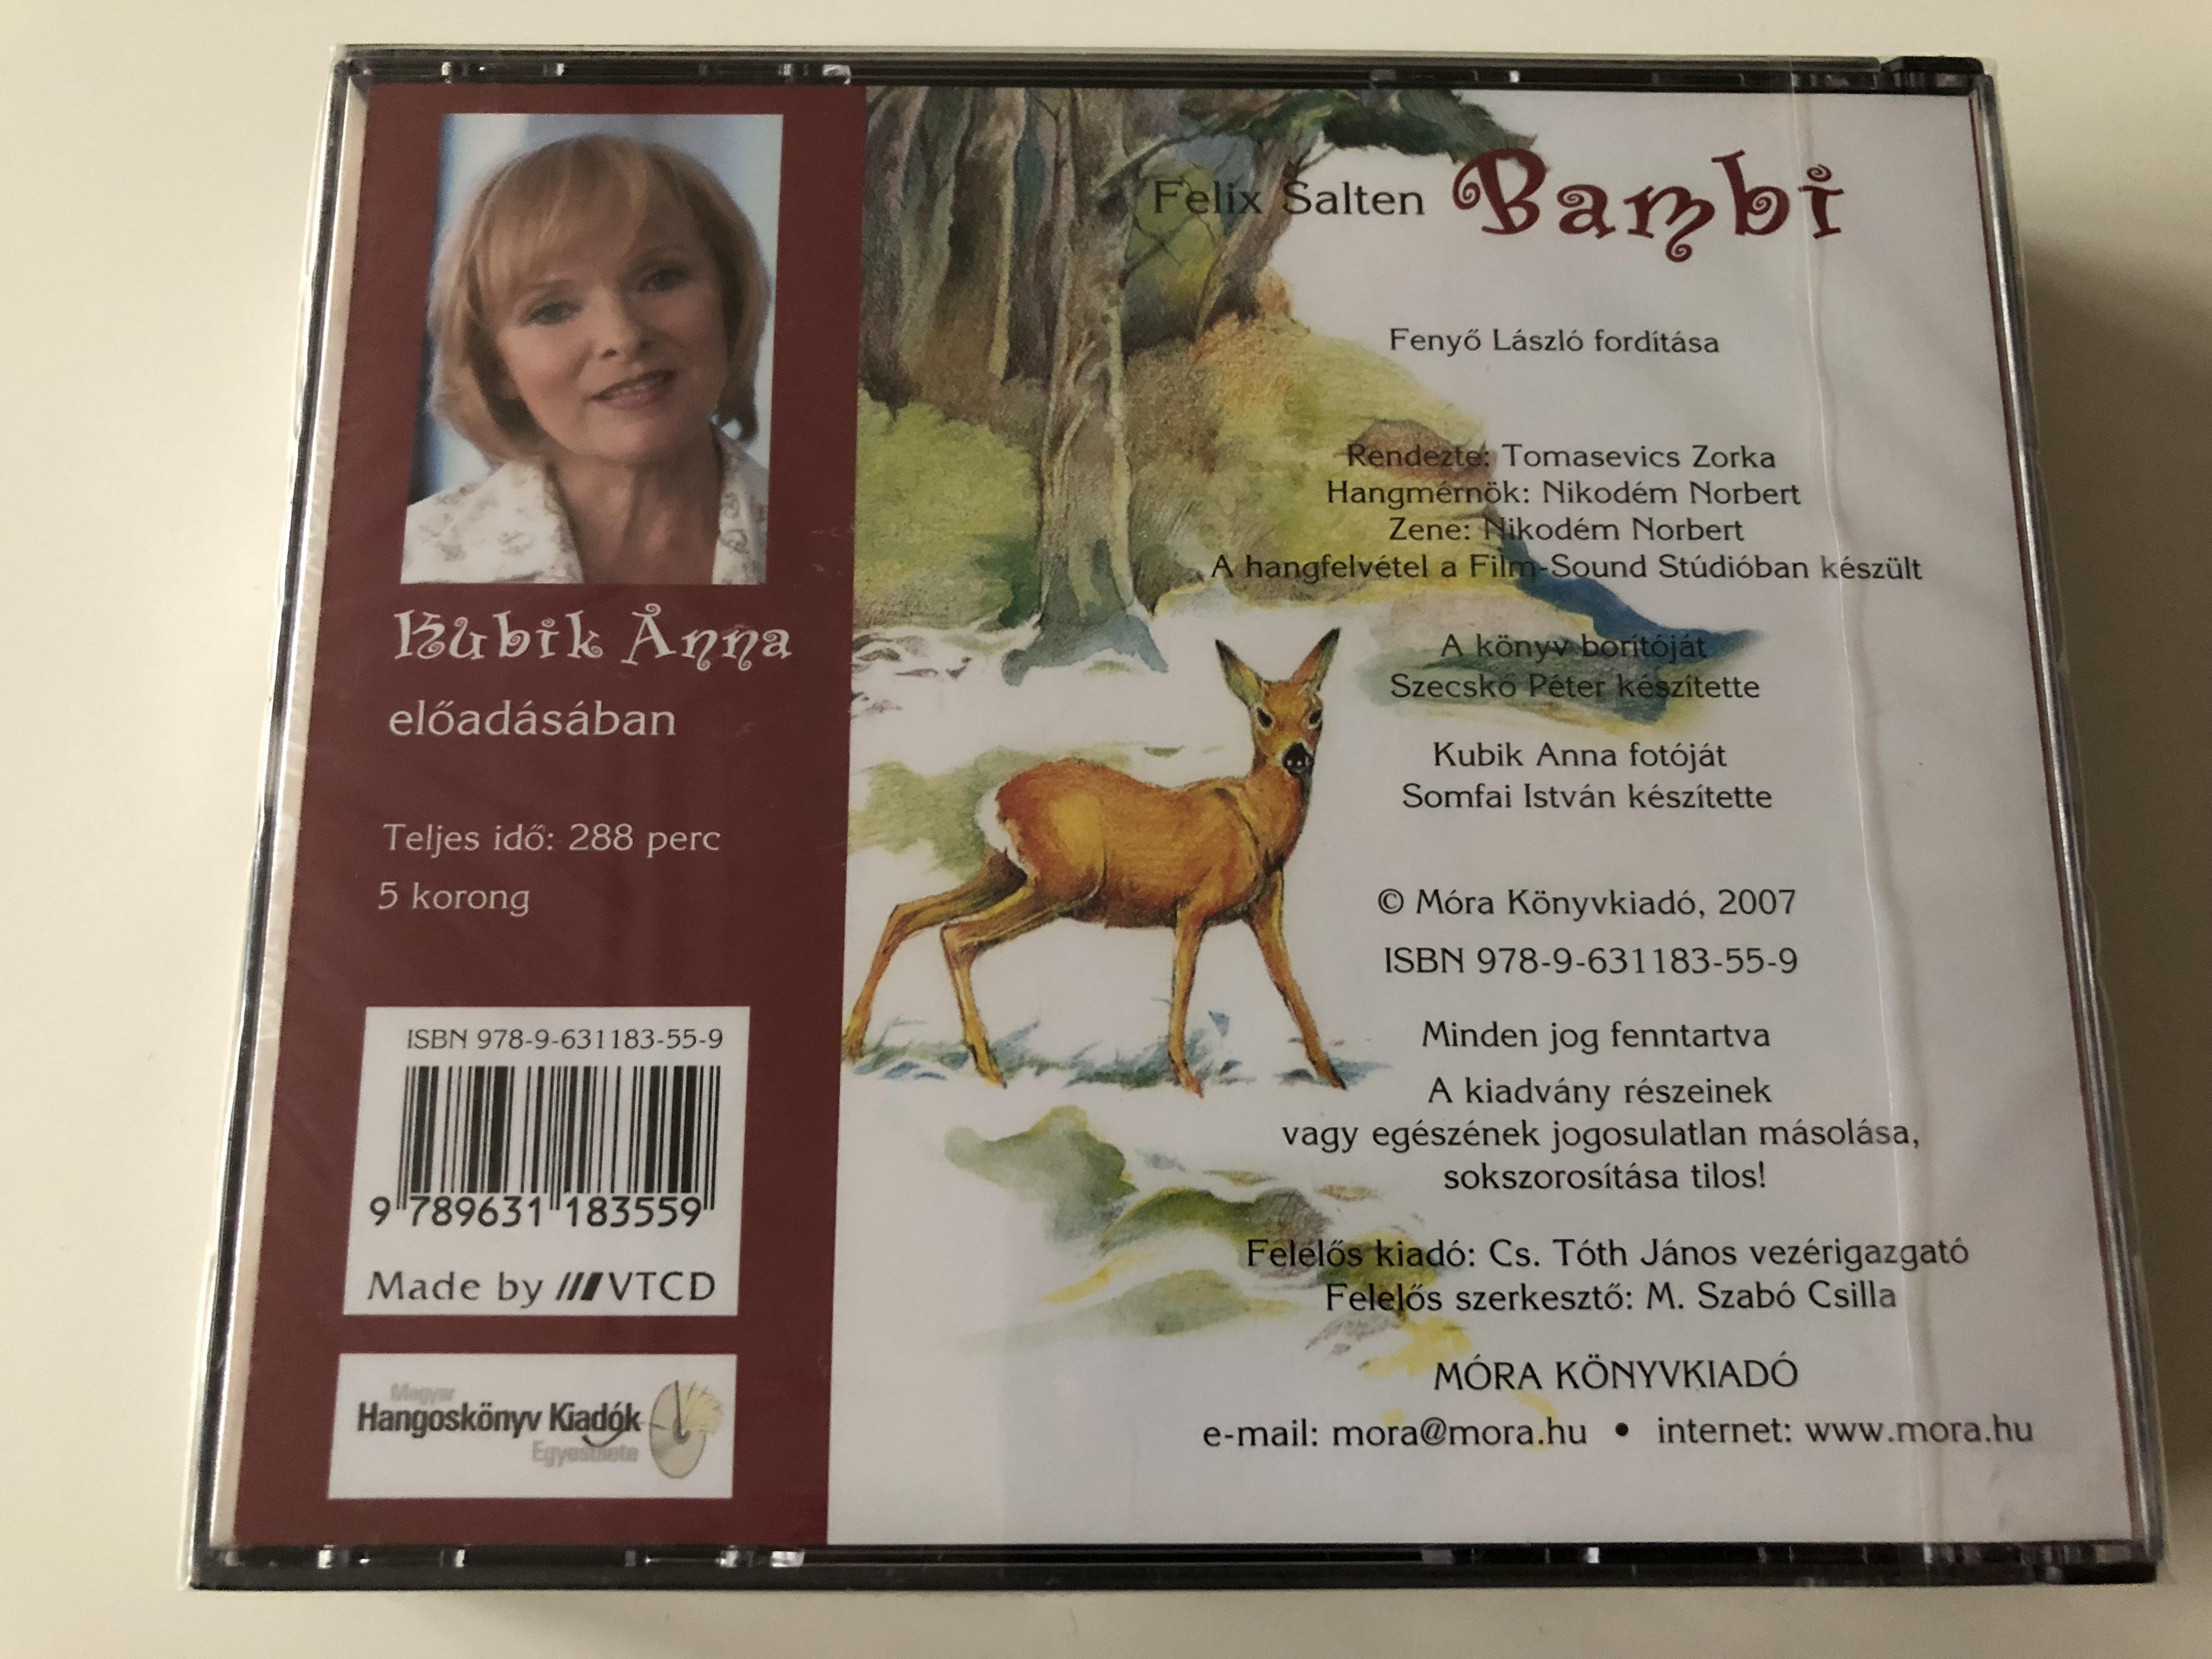 bambi-by-felix-salten-hungarian-language-audio-book-reak-by-kubik-anna-m-ra-k-nyvkiad-2007-5x-audio-cd-2-.jpg